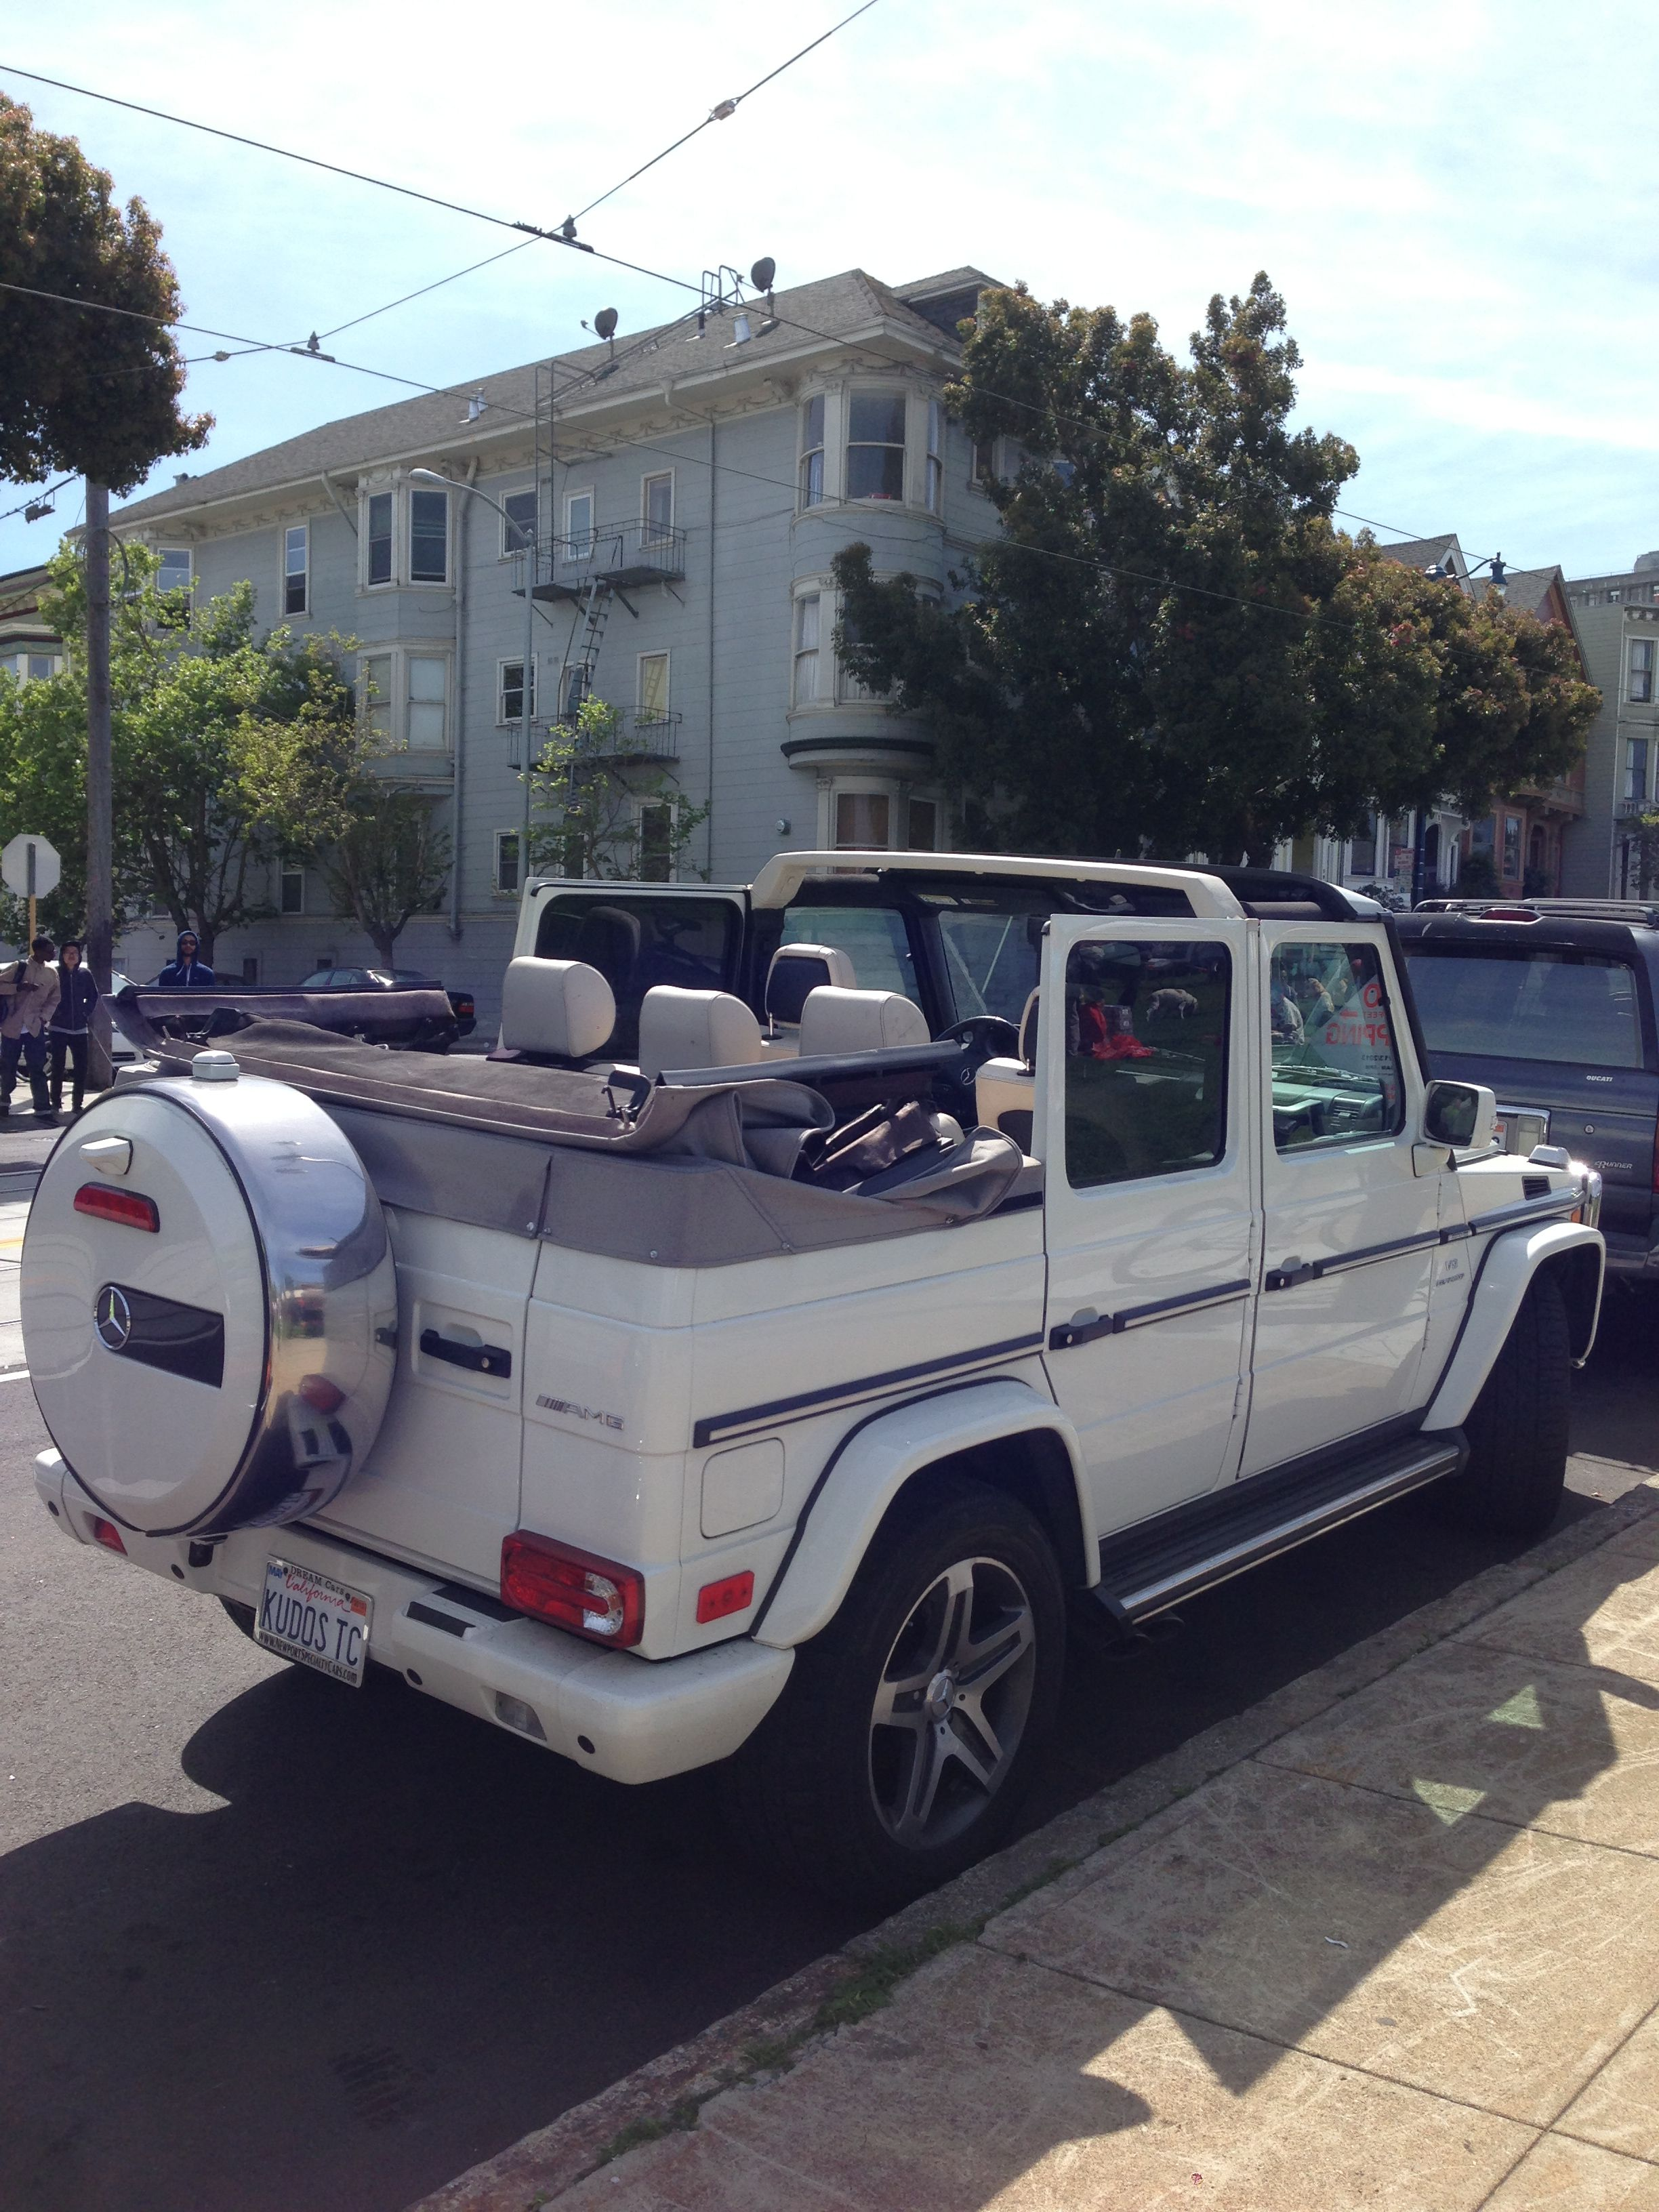 Custom G Wagon >> Custom G Wagon Convertible G Wagon Is My Dream Car This Is 3x